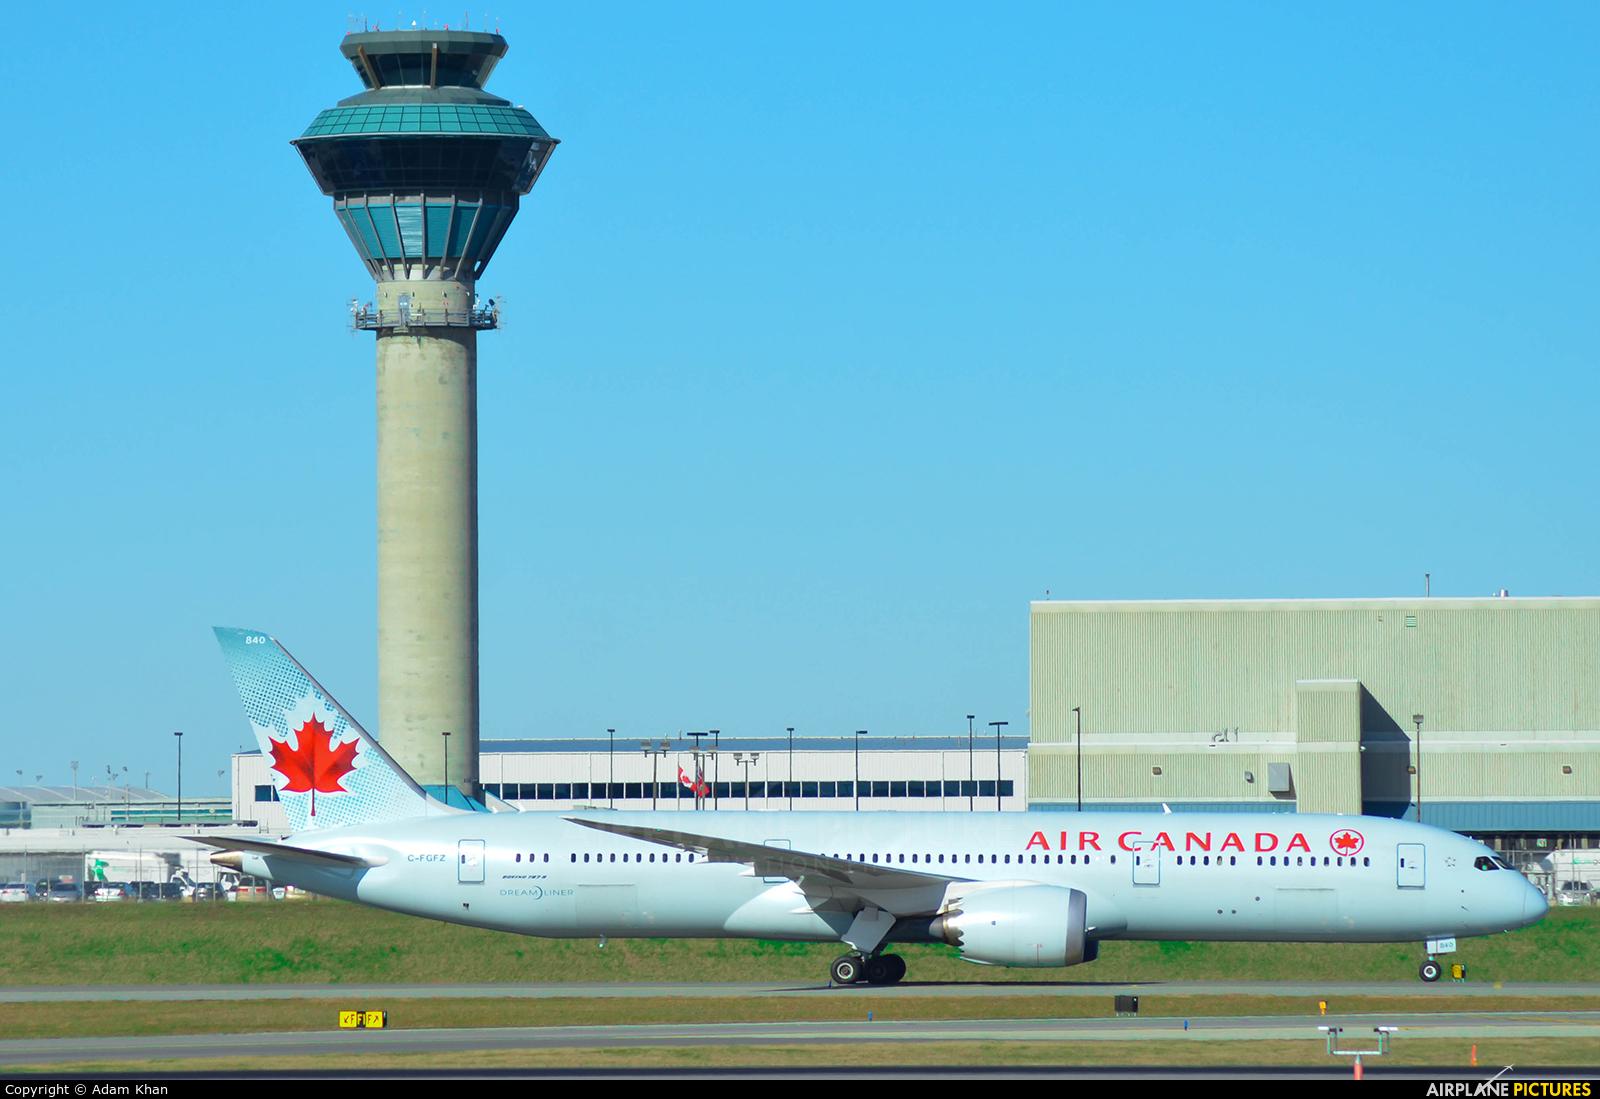 Air Canada C-FGFZ aircraft at Toronto - Pearson Intl, ON